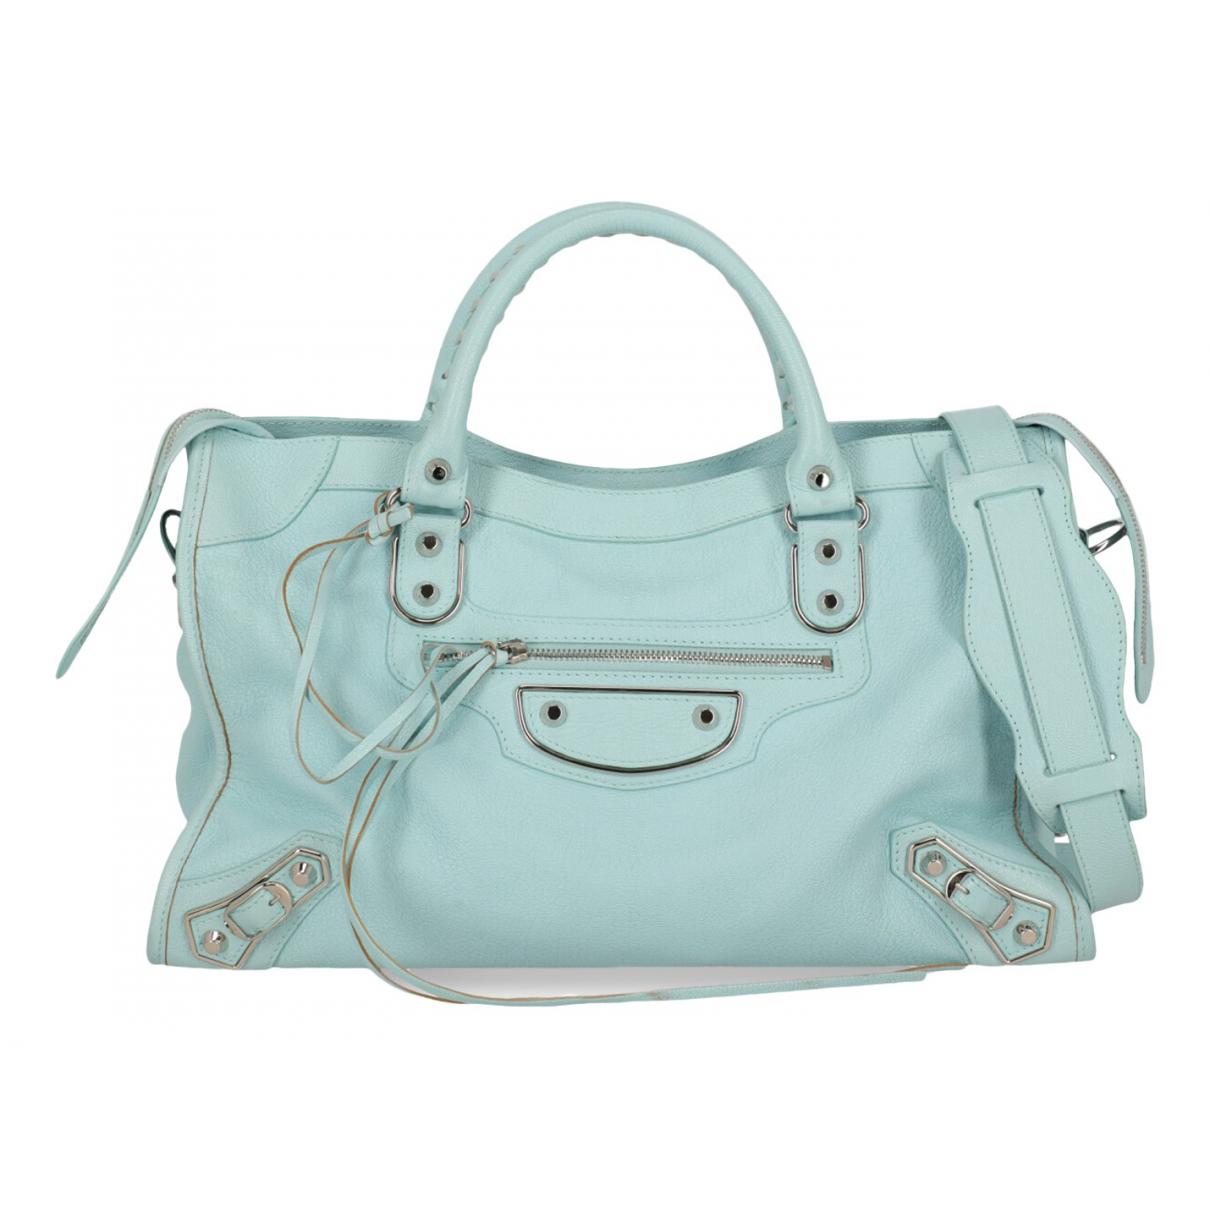 Balenciaga Classic Metalic Blue Leather handbag for Women N